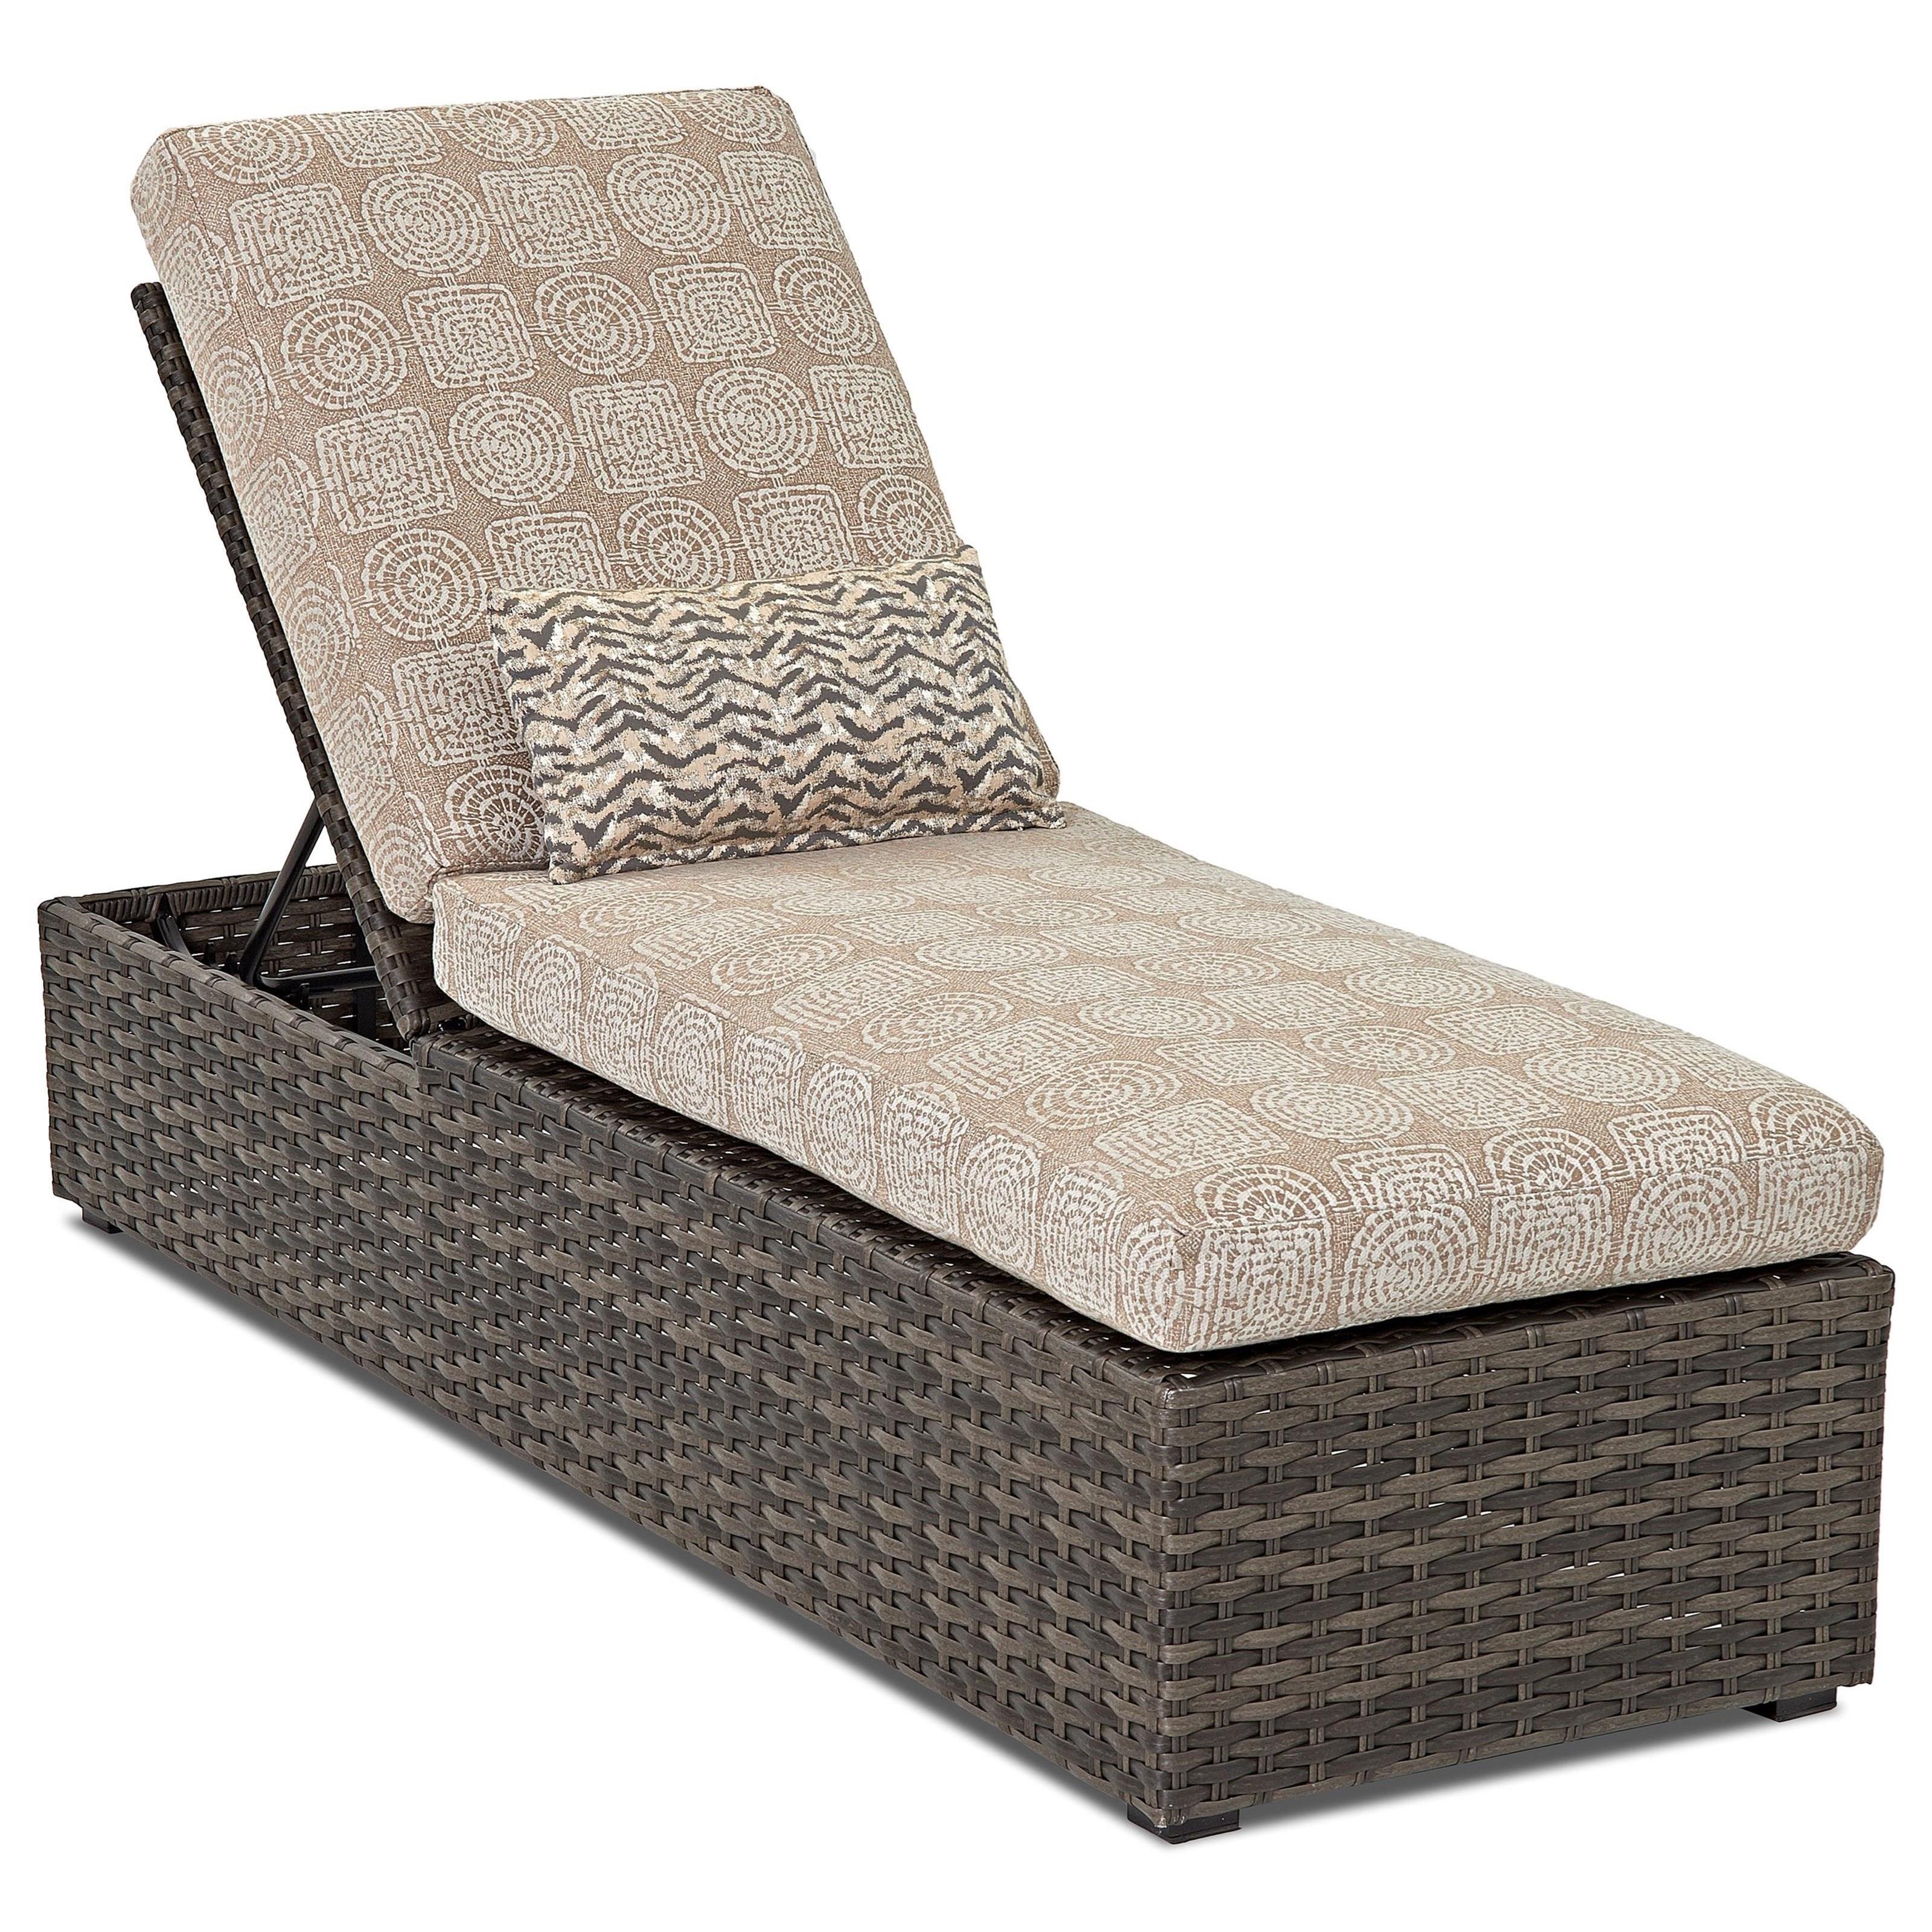 Chaise w/ Reversible Cushion